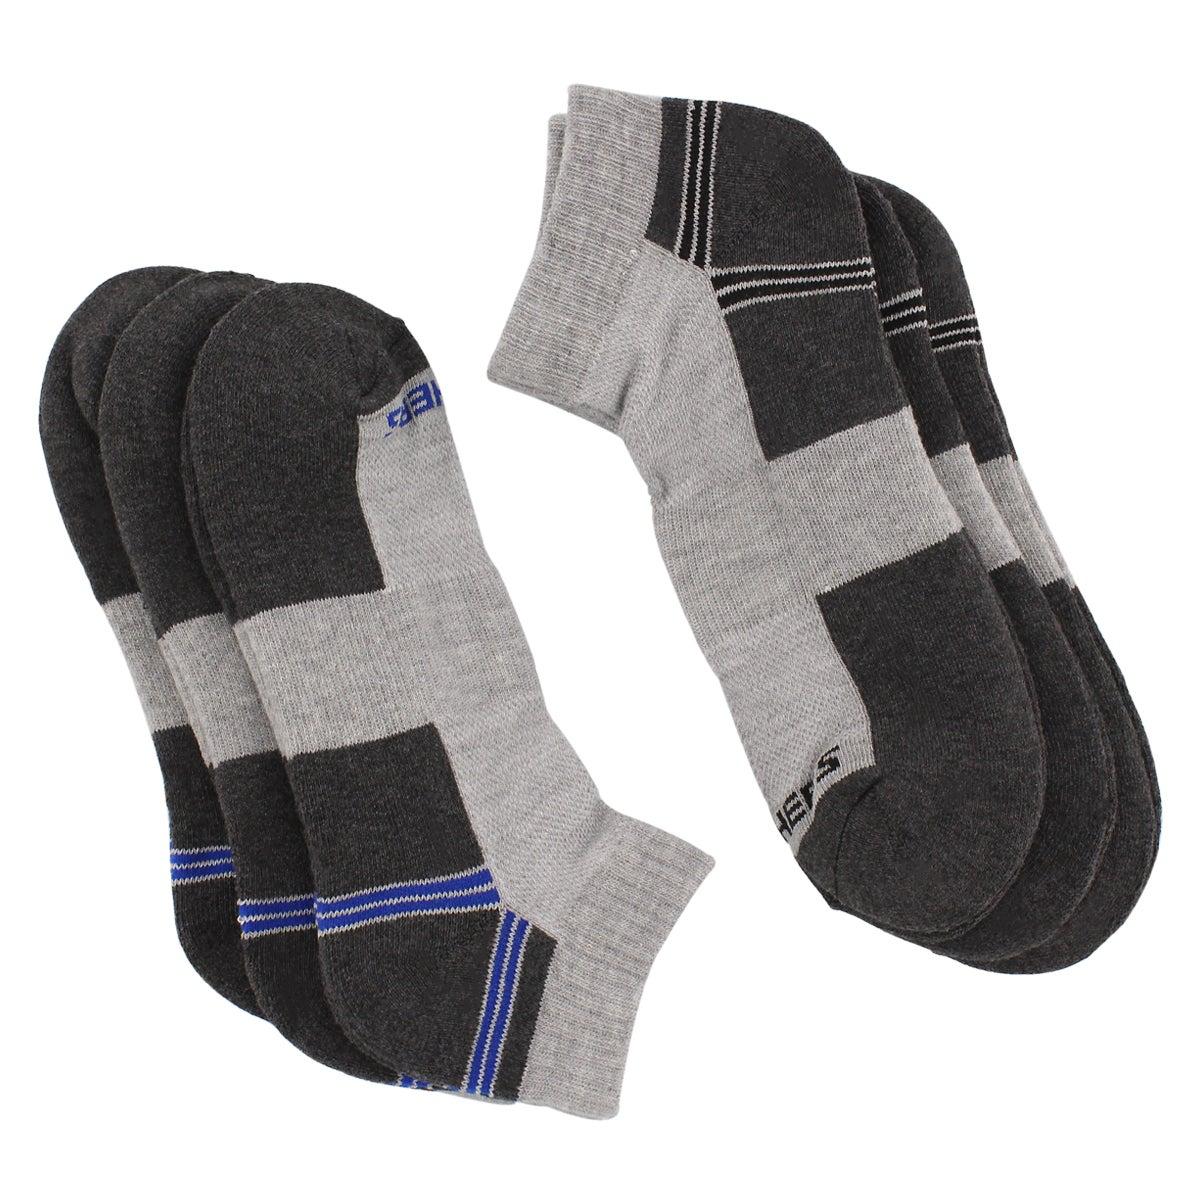 Men's HALF TERRY grey 1/4 crew socks - 6pk